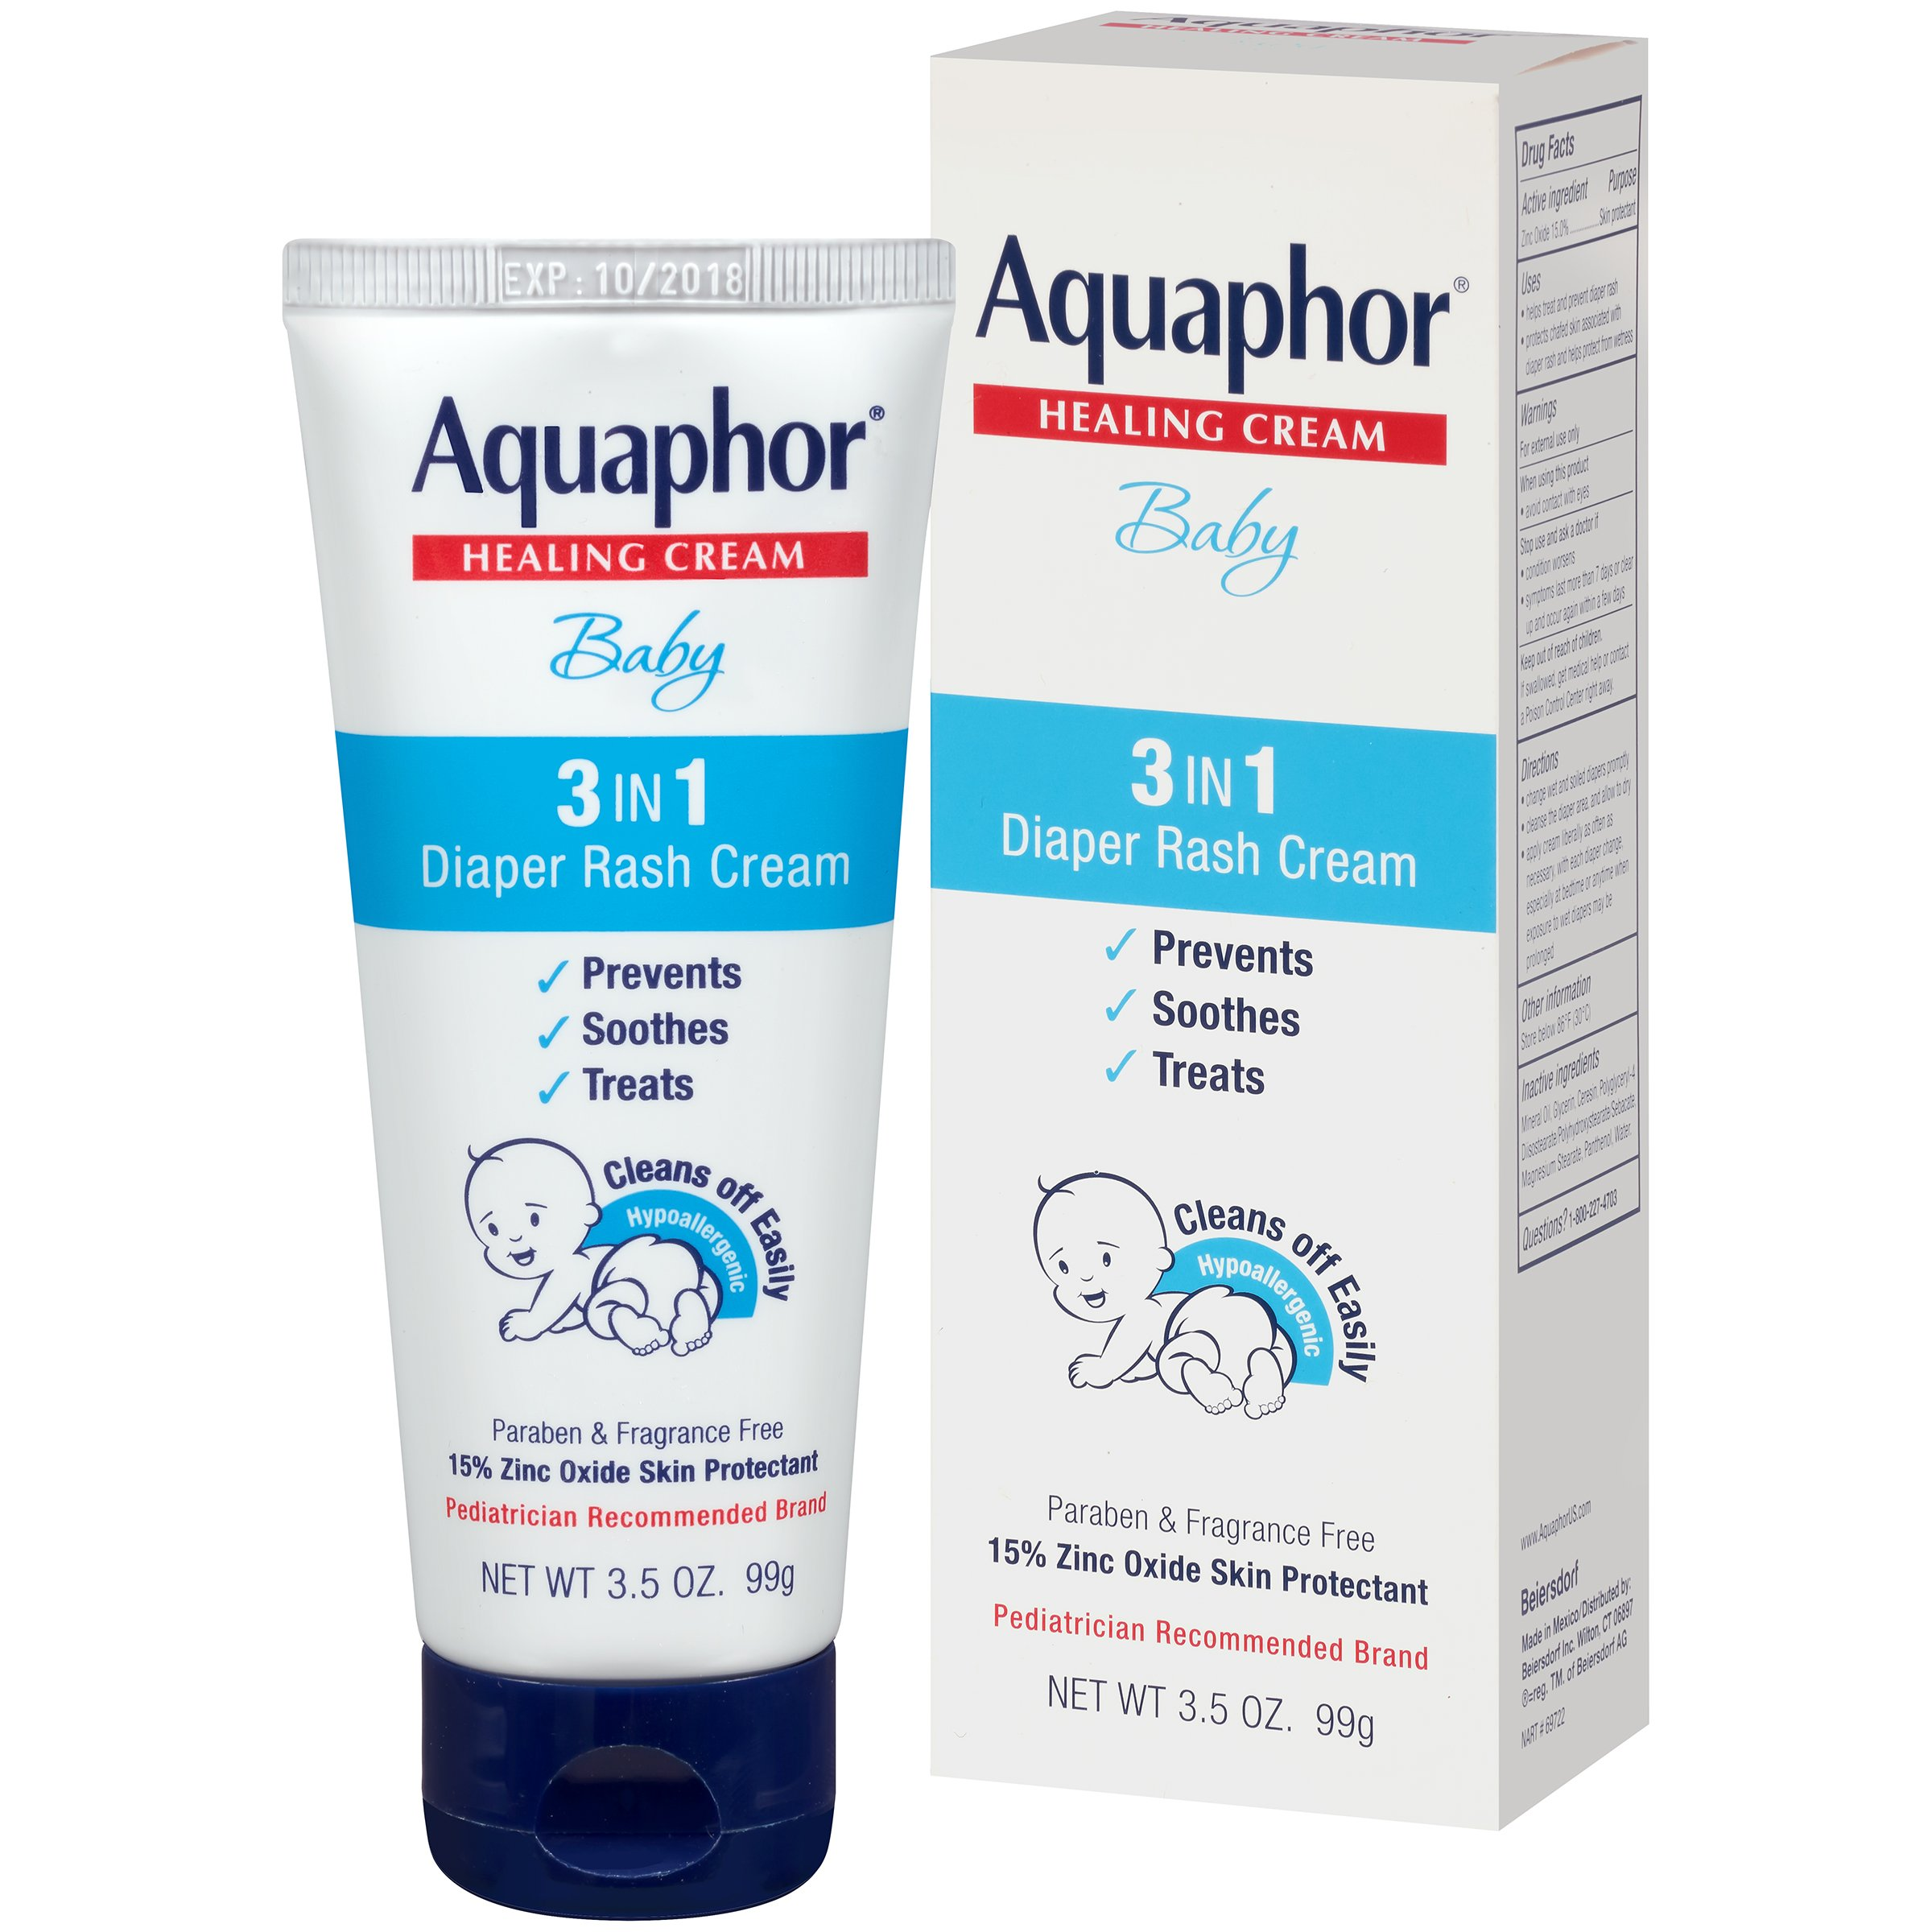 Aquaphor Baby Diaper Rash Cream 3.5 Ounce - Pediatrician Recommended Brand